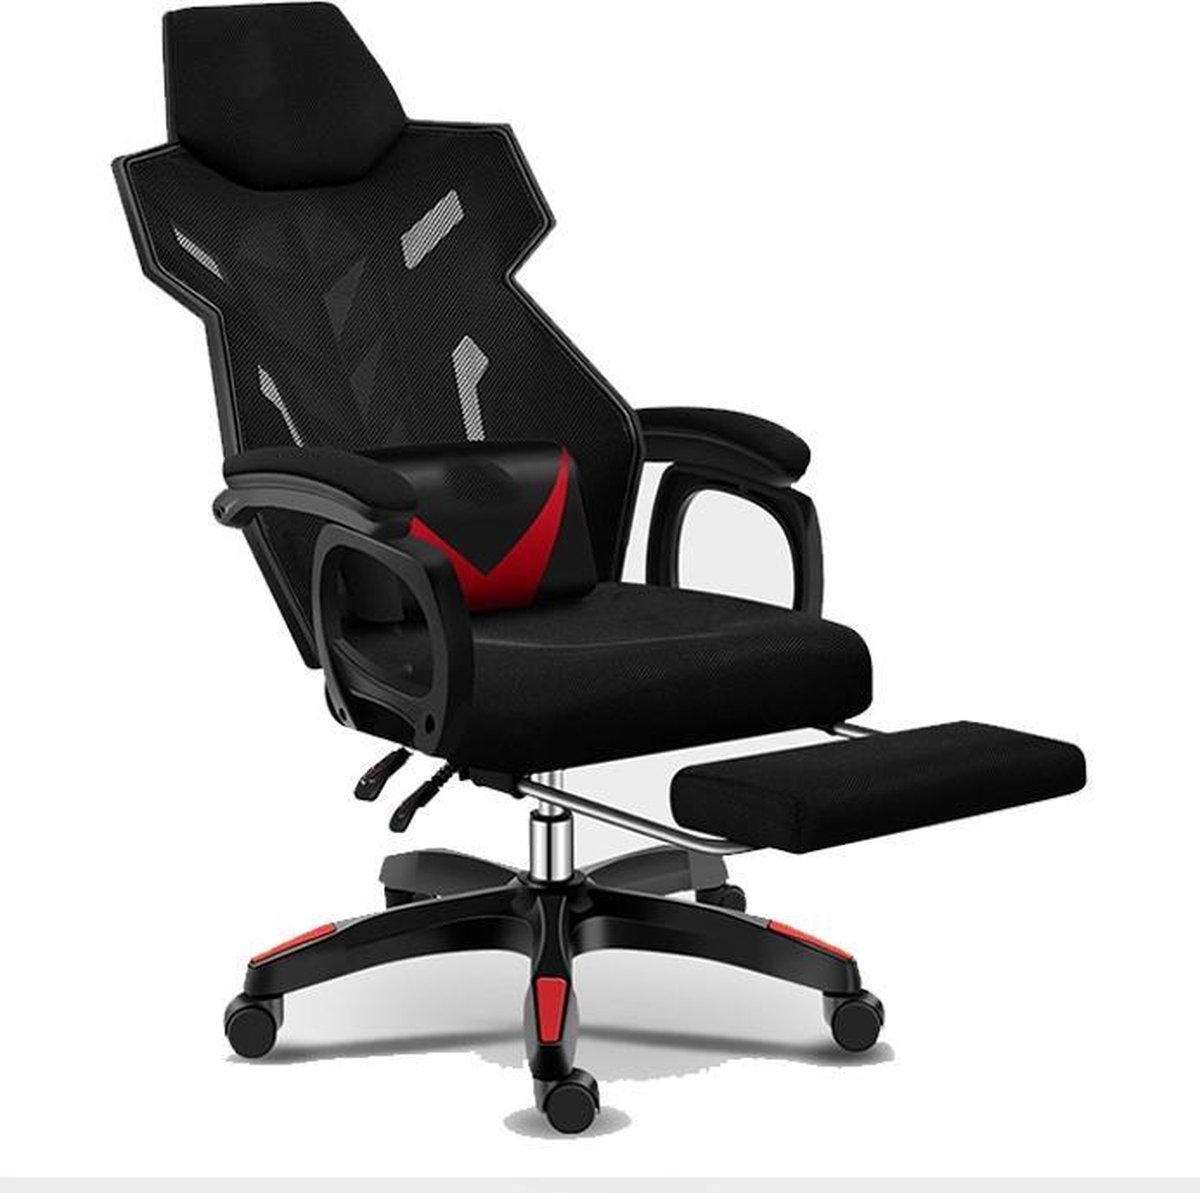 Game Stoel RaptorX Kazaxl - Gamestoel - Zwart - Rood - Gaming Chair - Met voetsteun - Bureaustoel